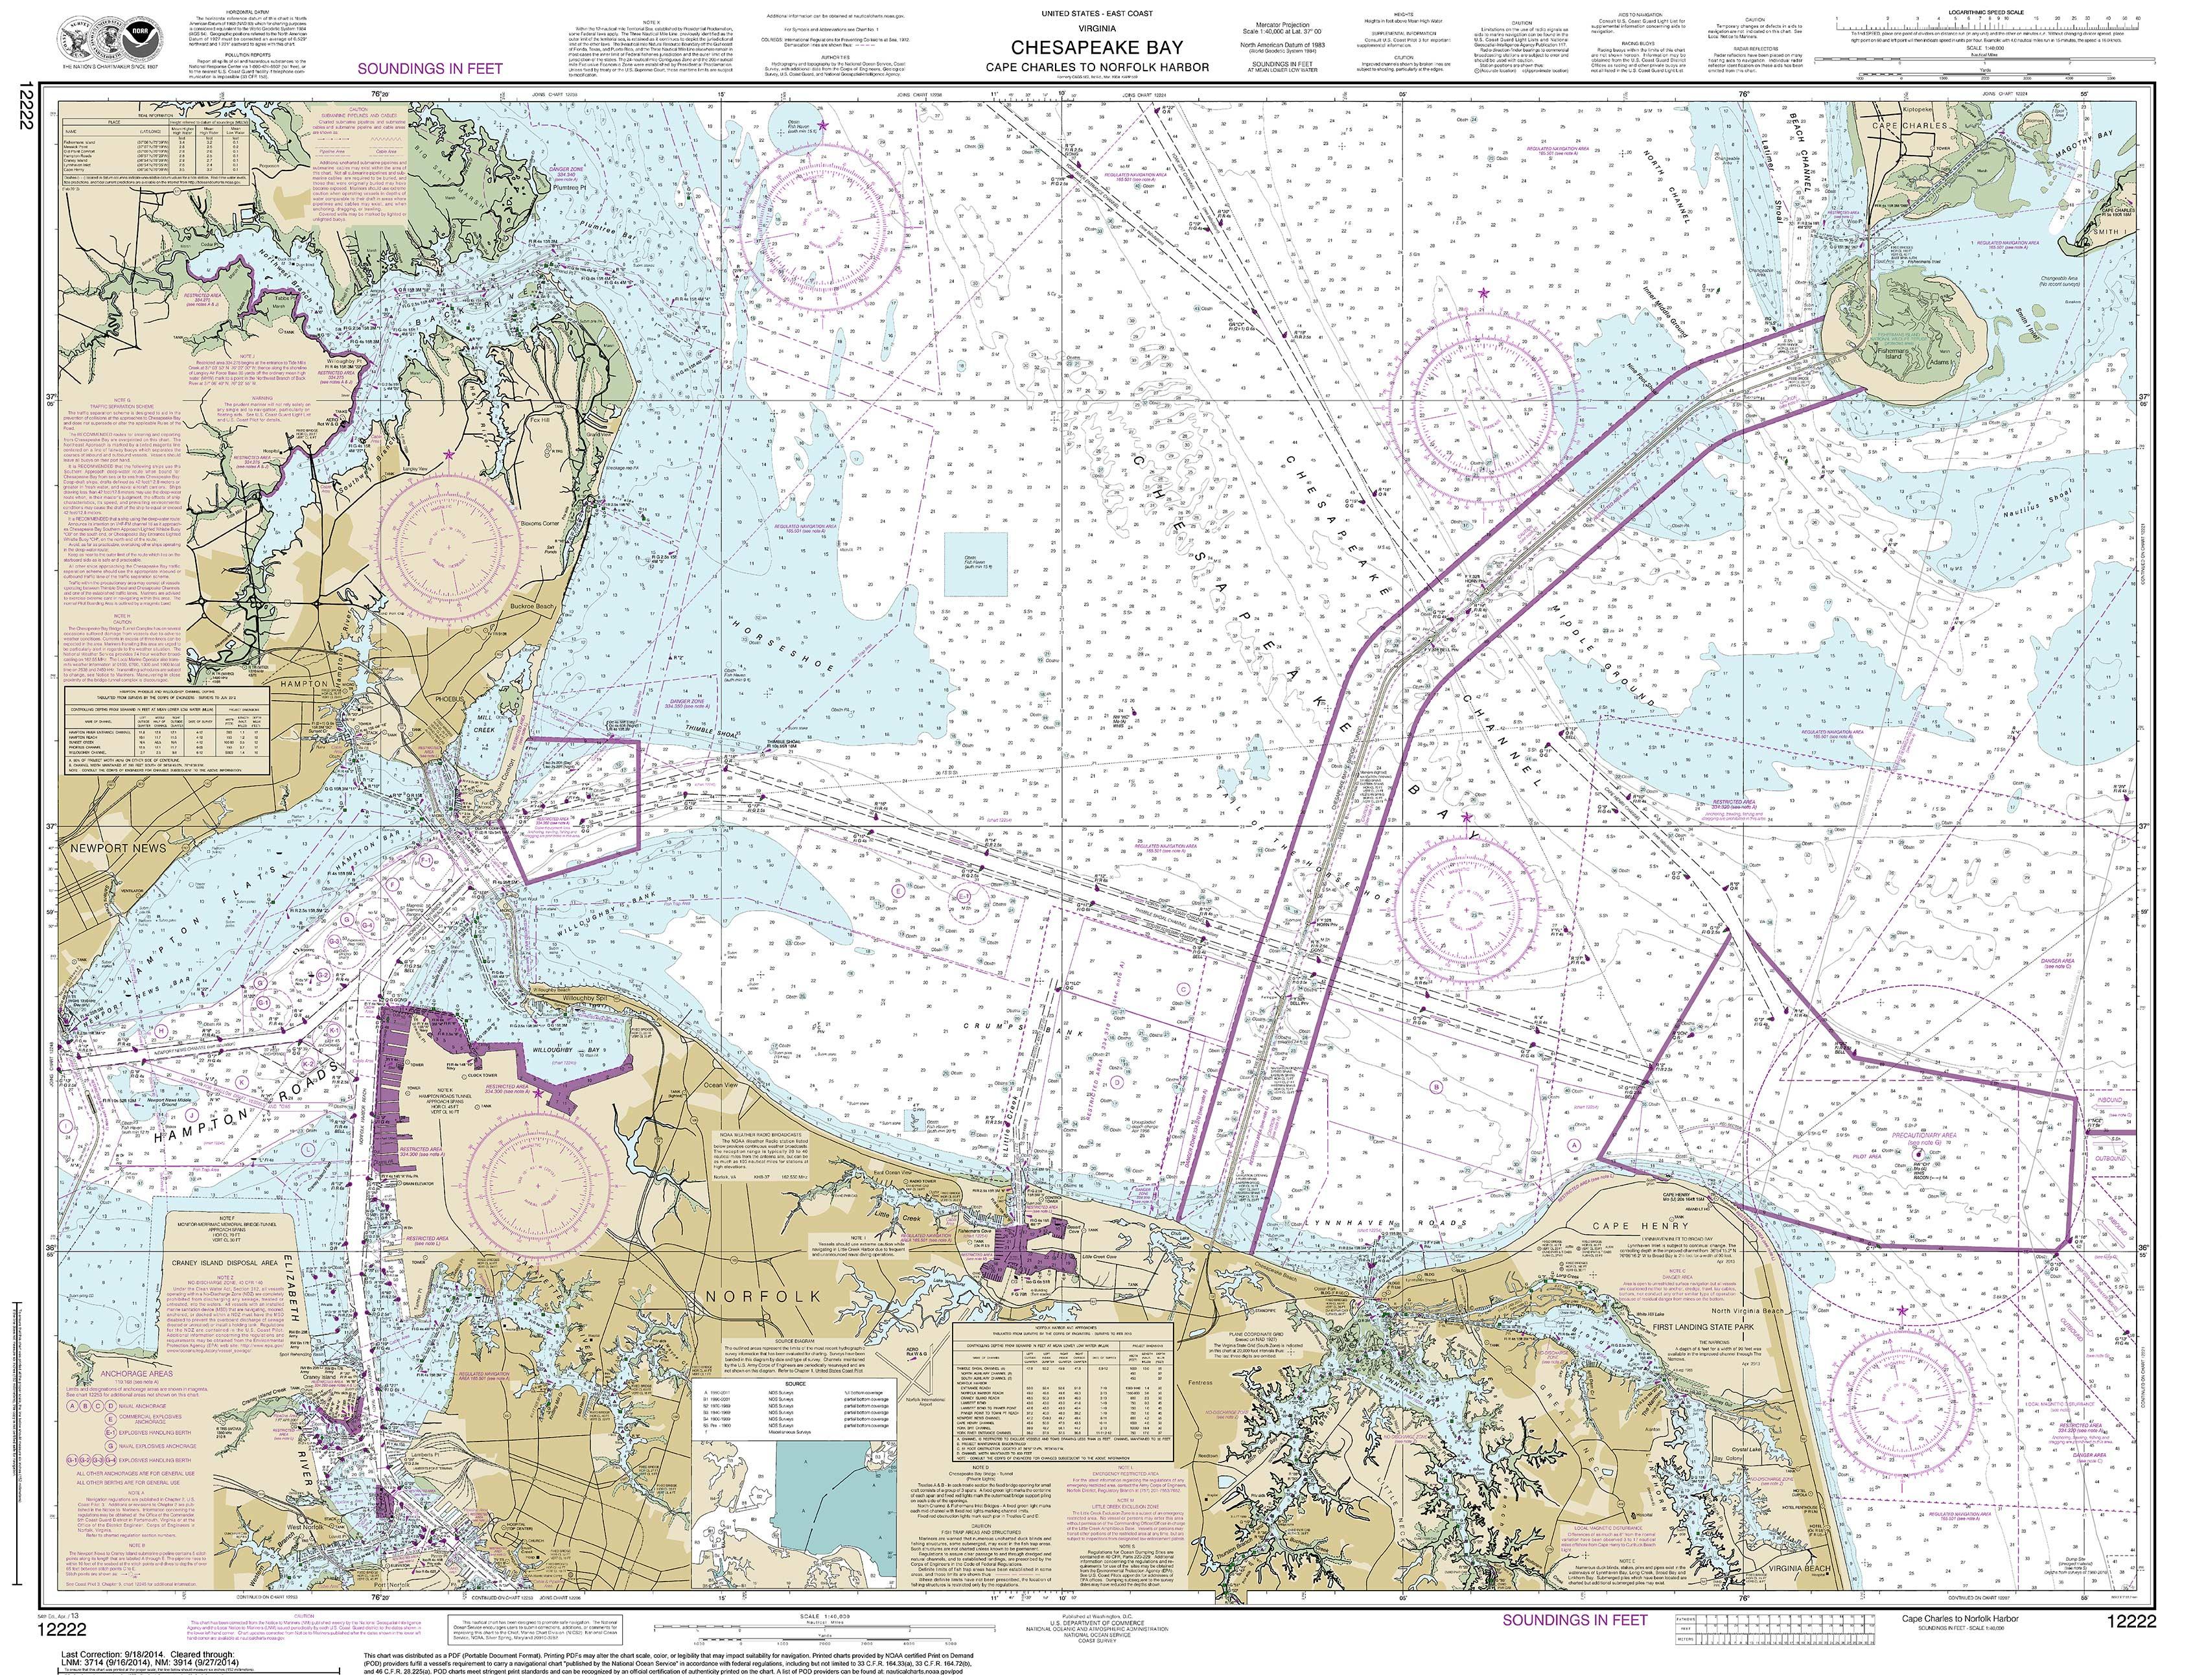 nautical charts norfolk va - Mersn.proforum.co